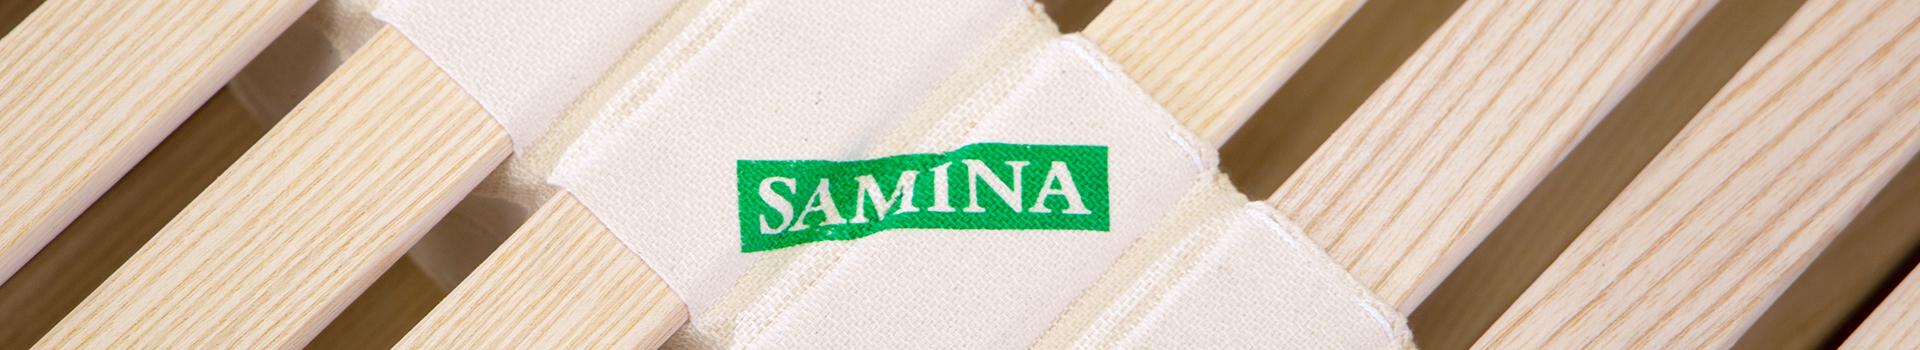 Reviews – Samina Sleep